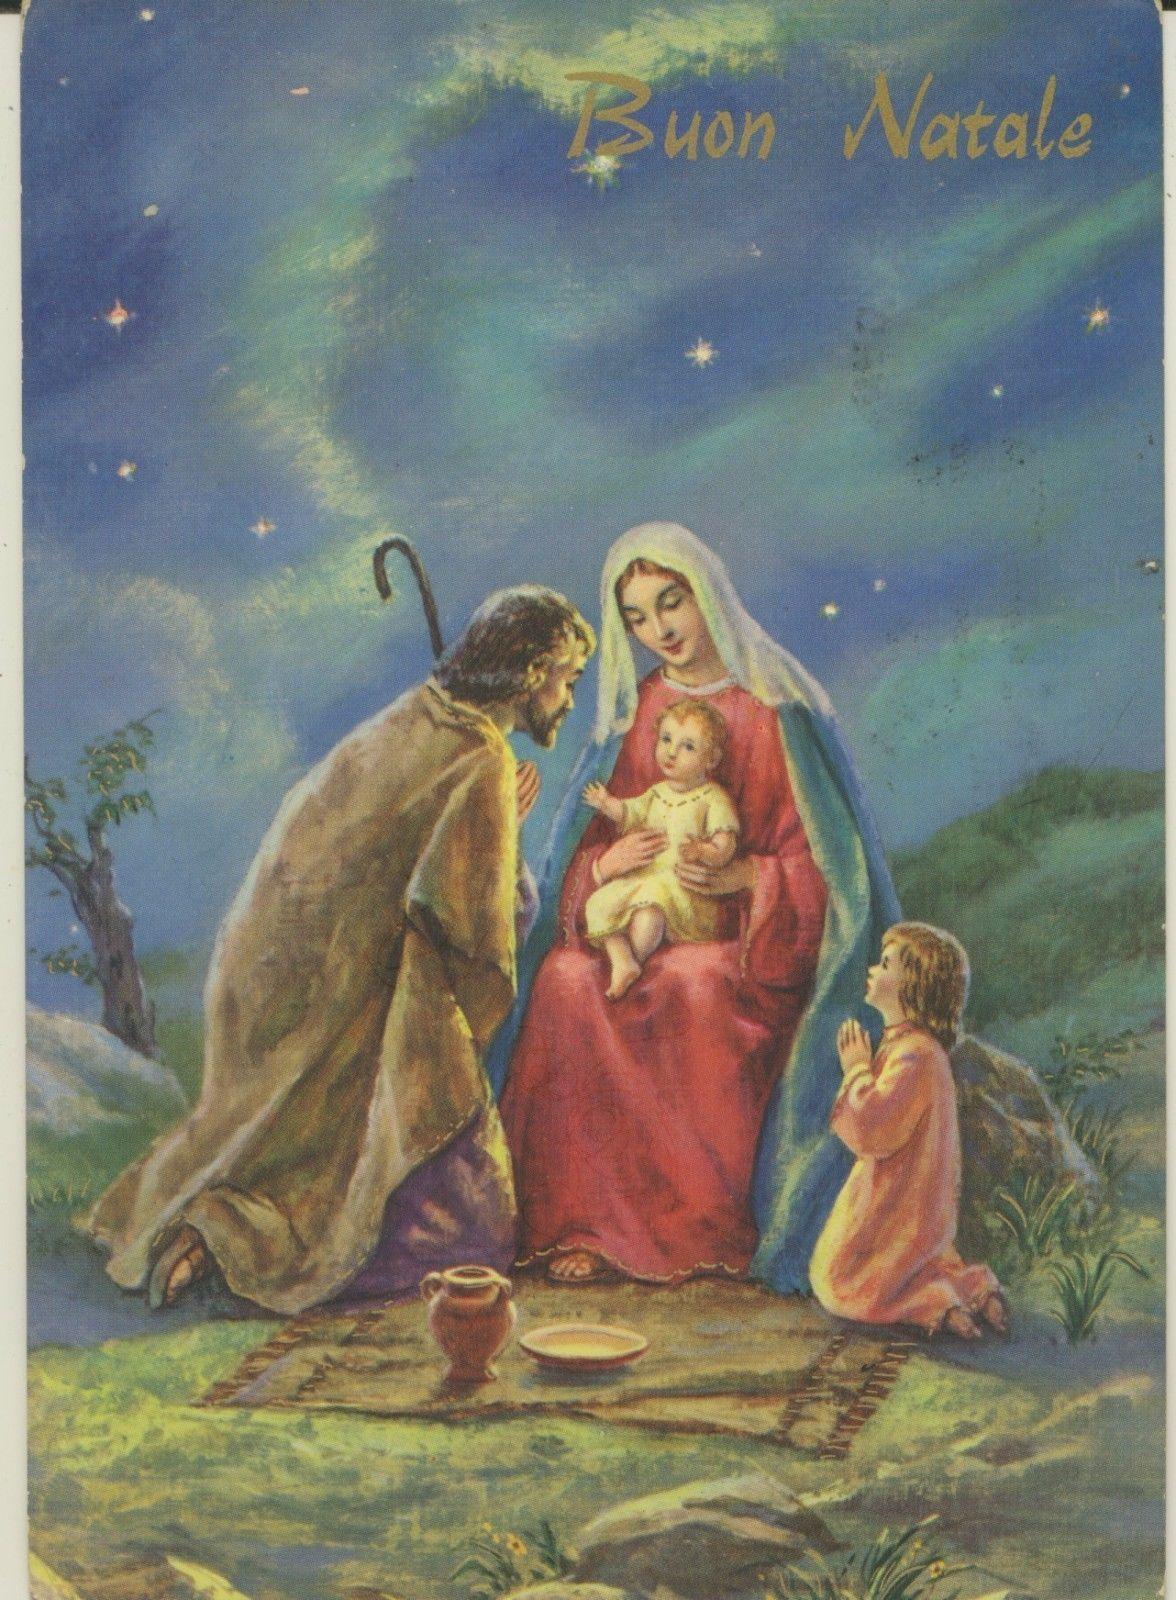 Immagini Sacre Natale.Cartolina Illustratore Augurale Buon Natale Sacra Famiglia